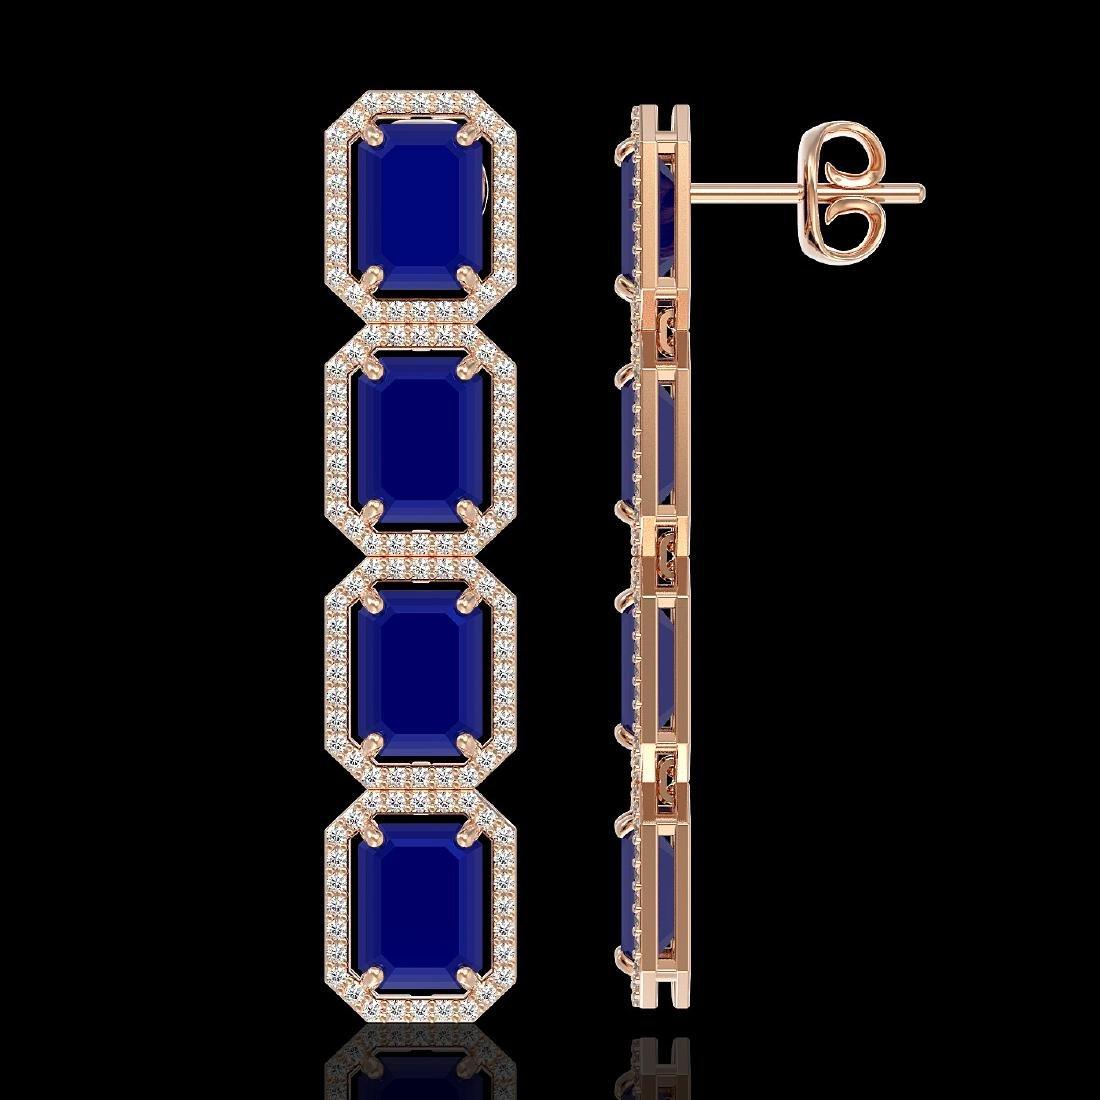 20.59 CTW Sapphire & Diamond Halo Earrings 10K Rose - 2